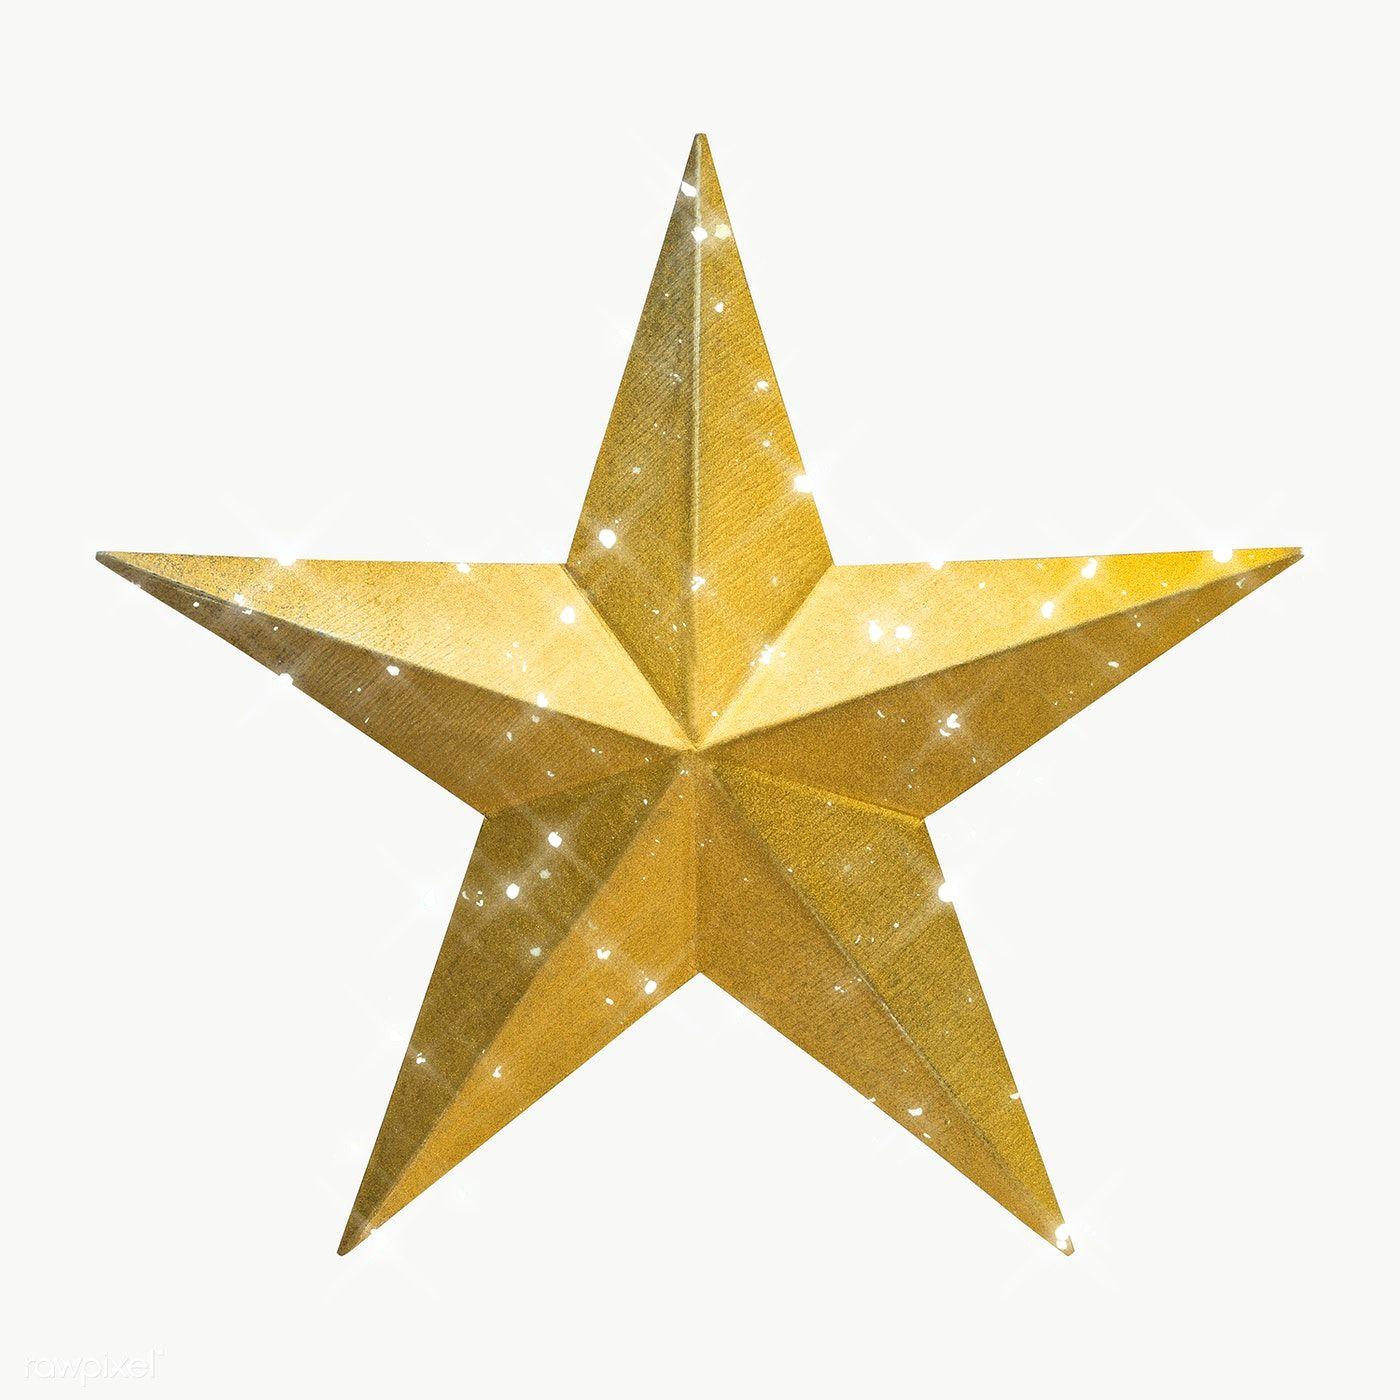 Sparkling Gold Star Design Element Free Image By Rawpixel Com Manotang Star Illustration Gold Stars Design Element